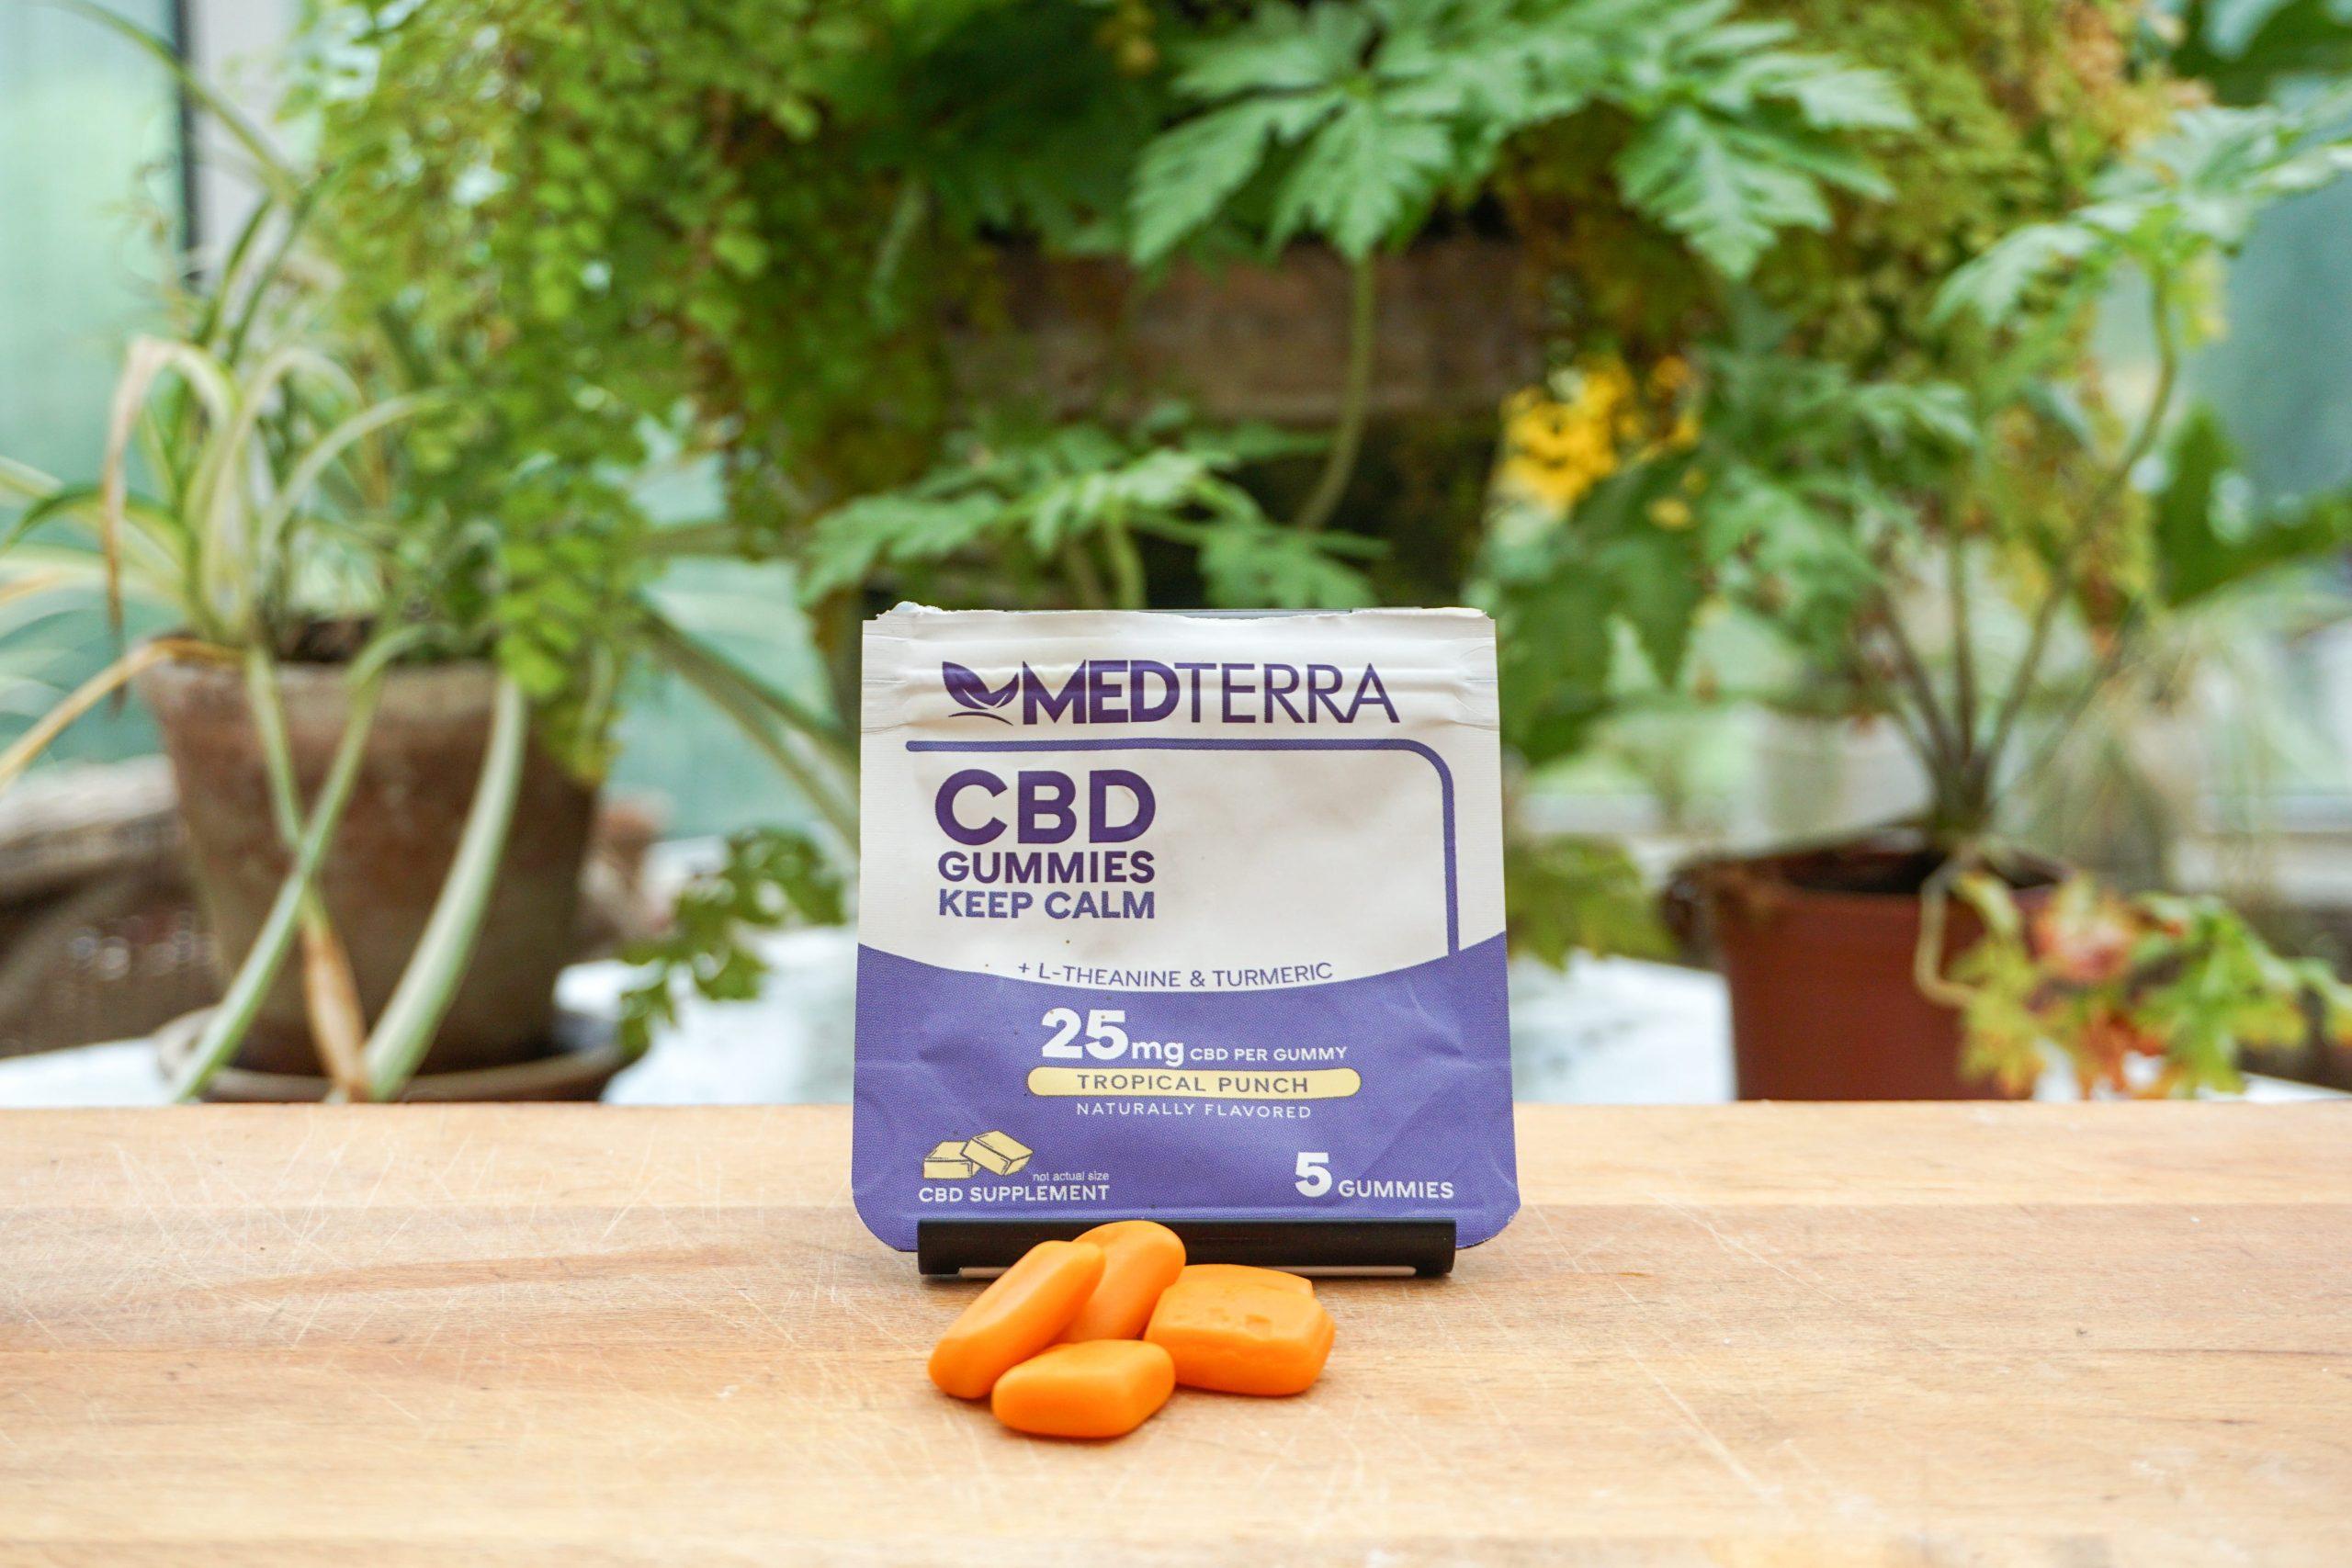 Medterra CBD gummies review coupons 2021